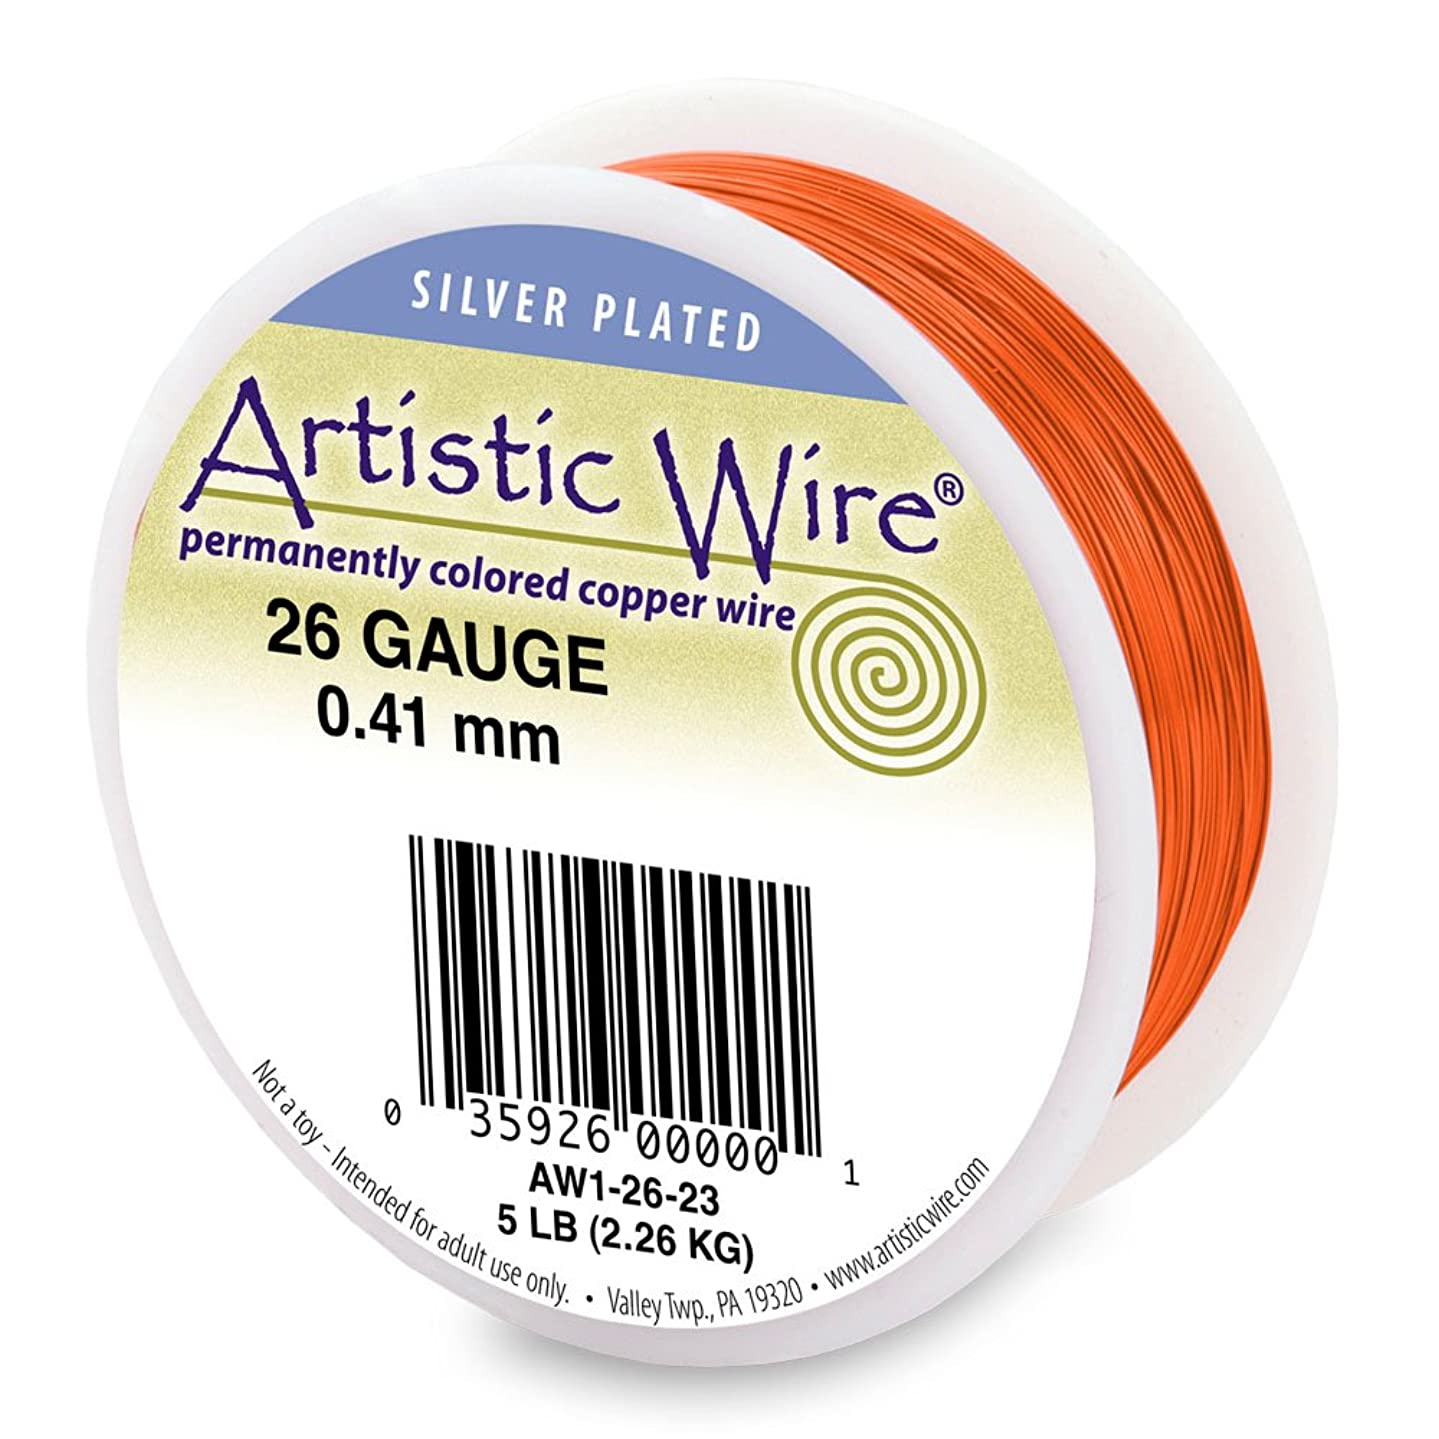 Artistic Wire 26-Gauge Silver Plated Tangerine Wire, 1/4-Pound